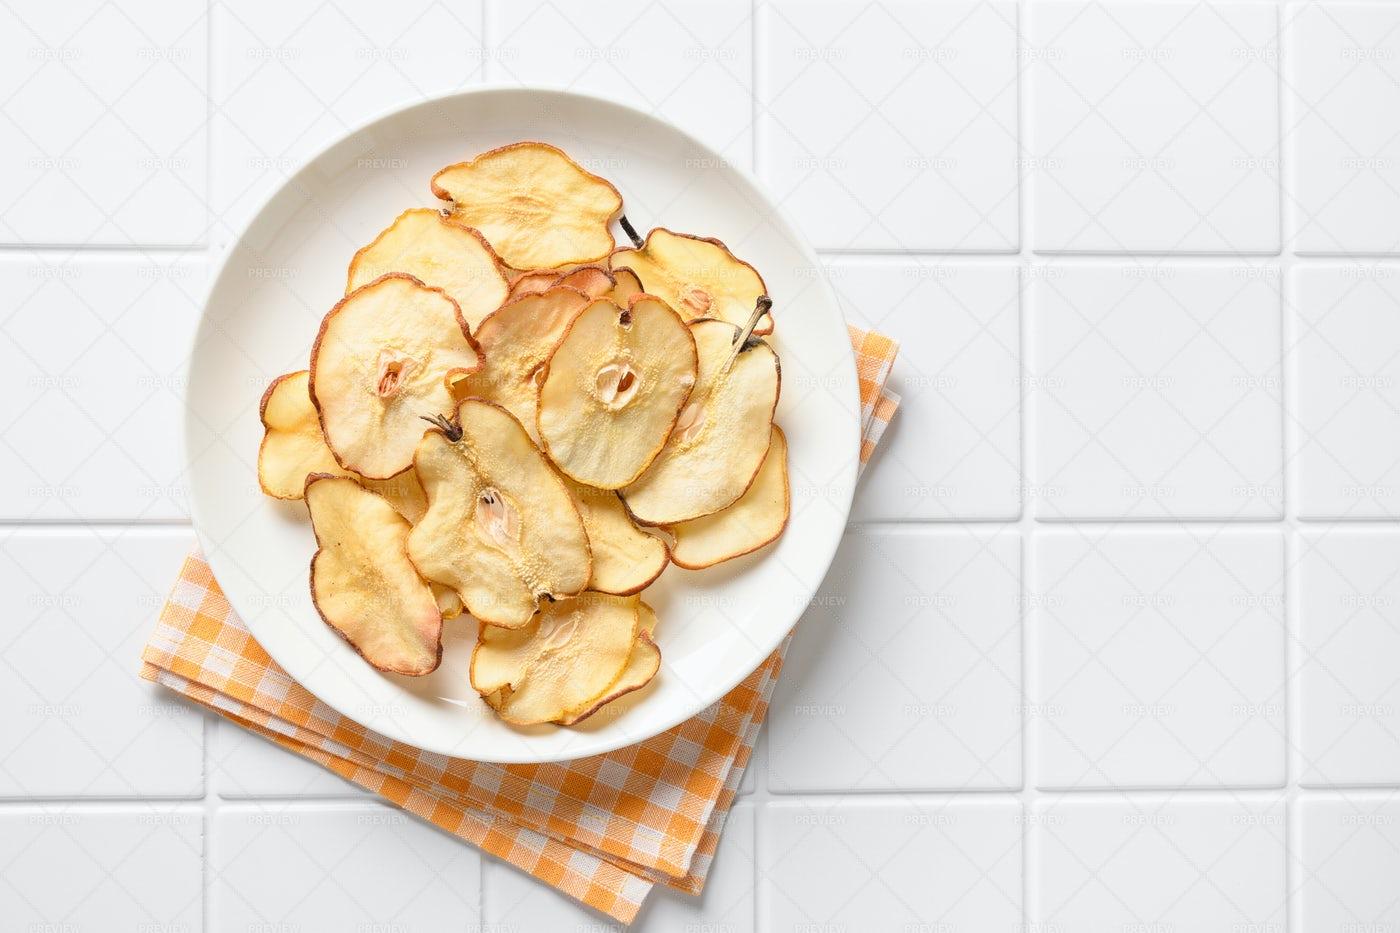 Tasty Dried Fruits: Stock Photos